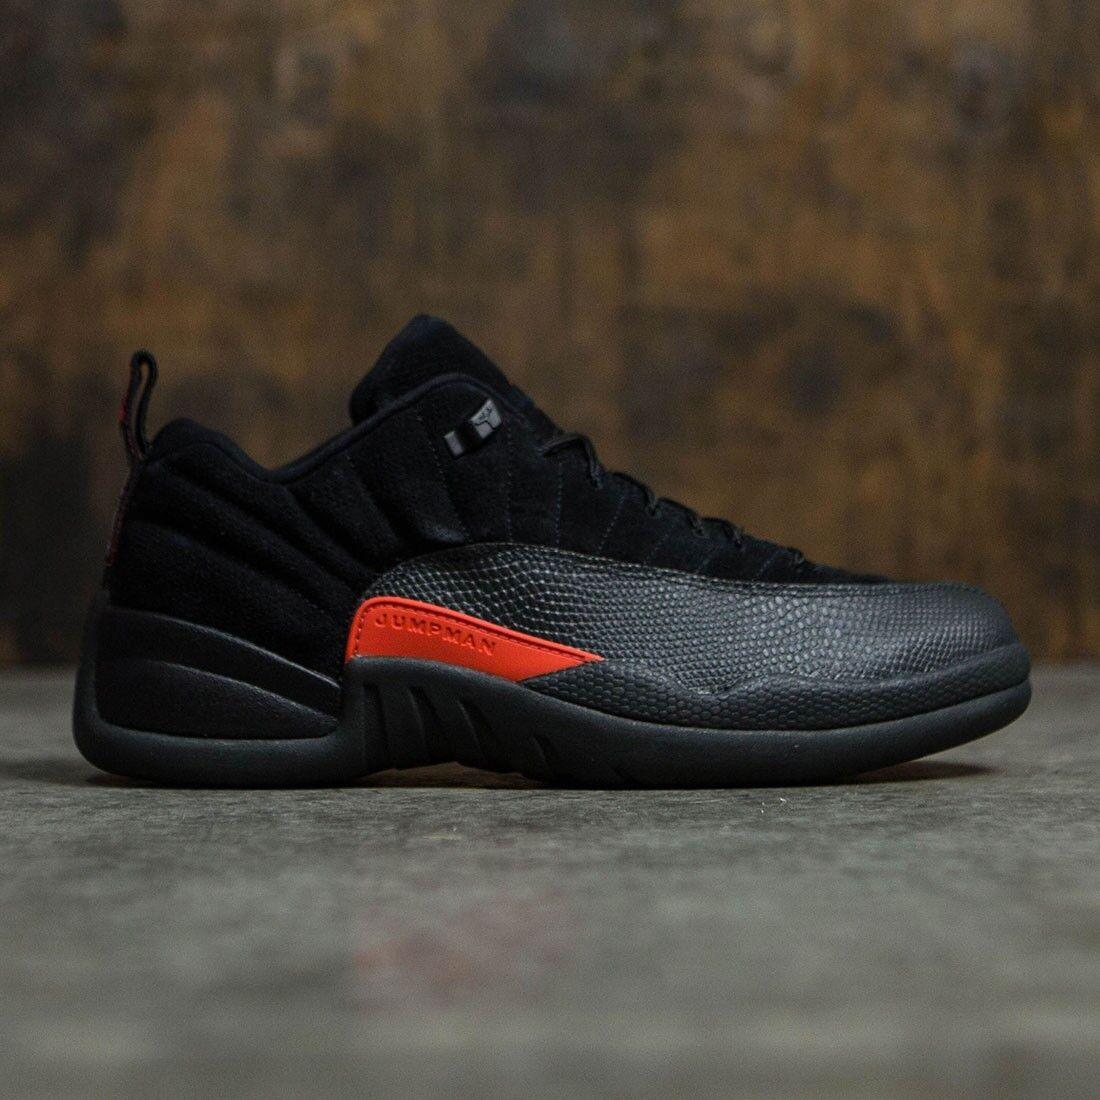 Nike Air Jordan 12 12 12 XII Retro Low Black Max orange Size 10.5. 308317-003 playoff b3e54f